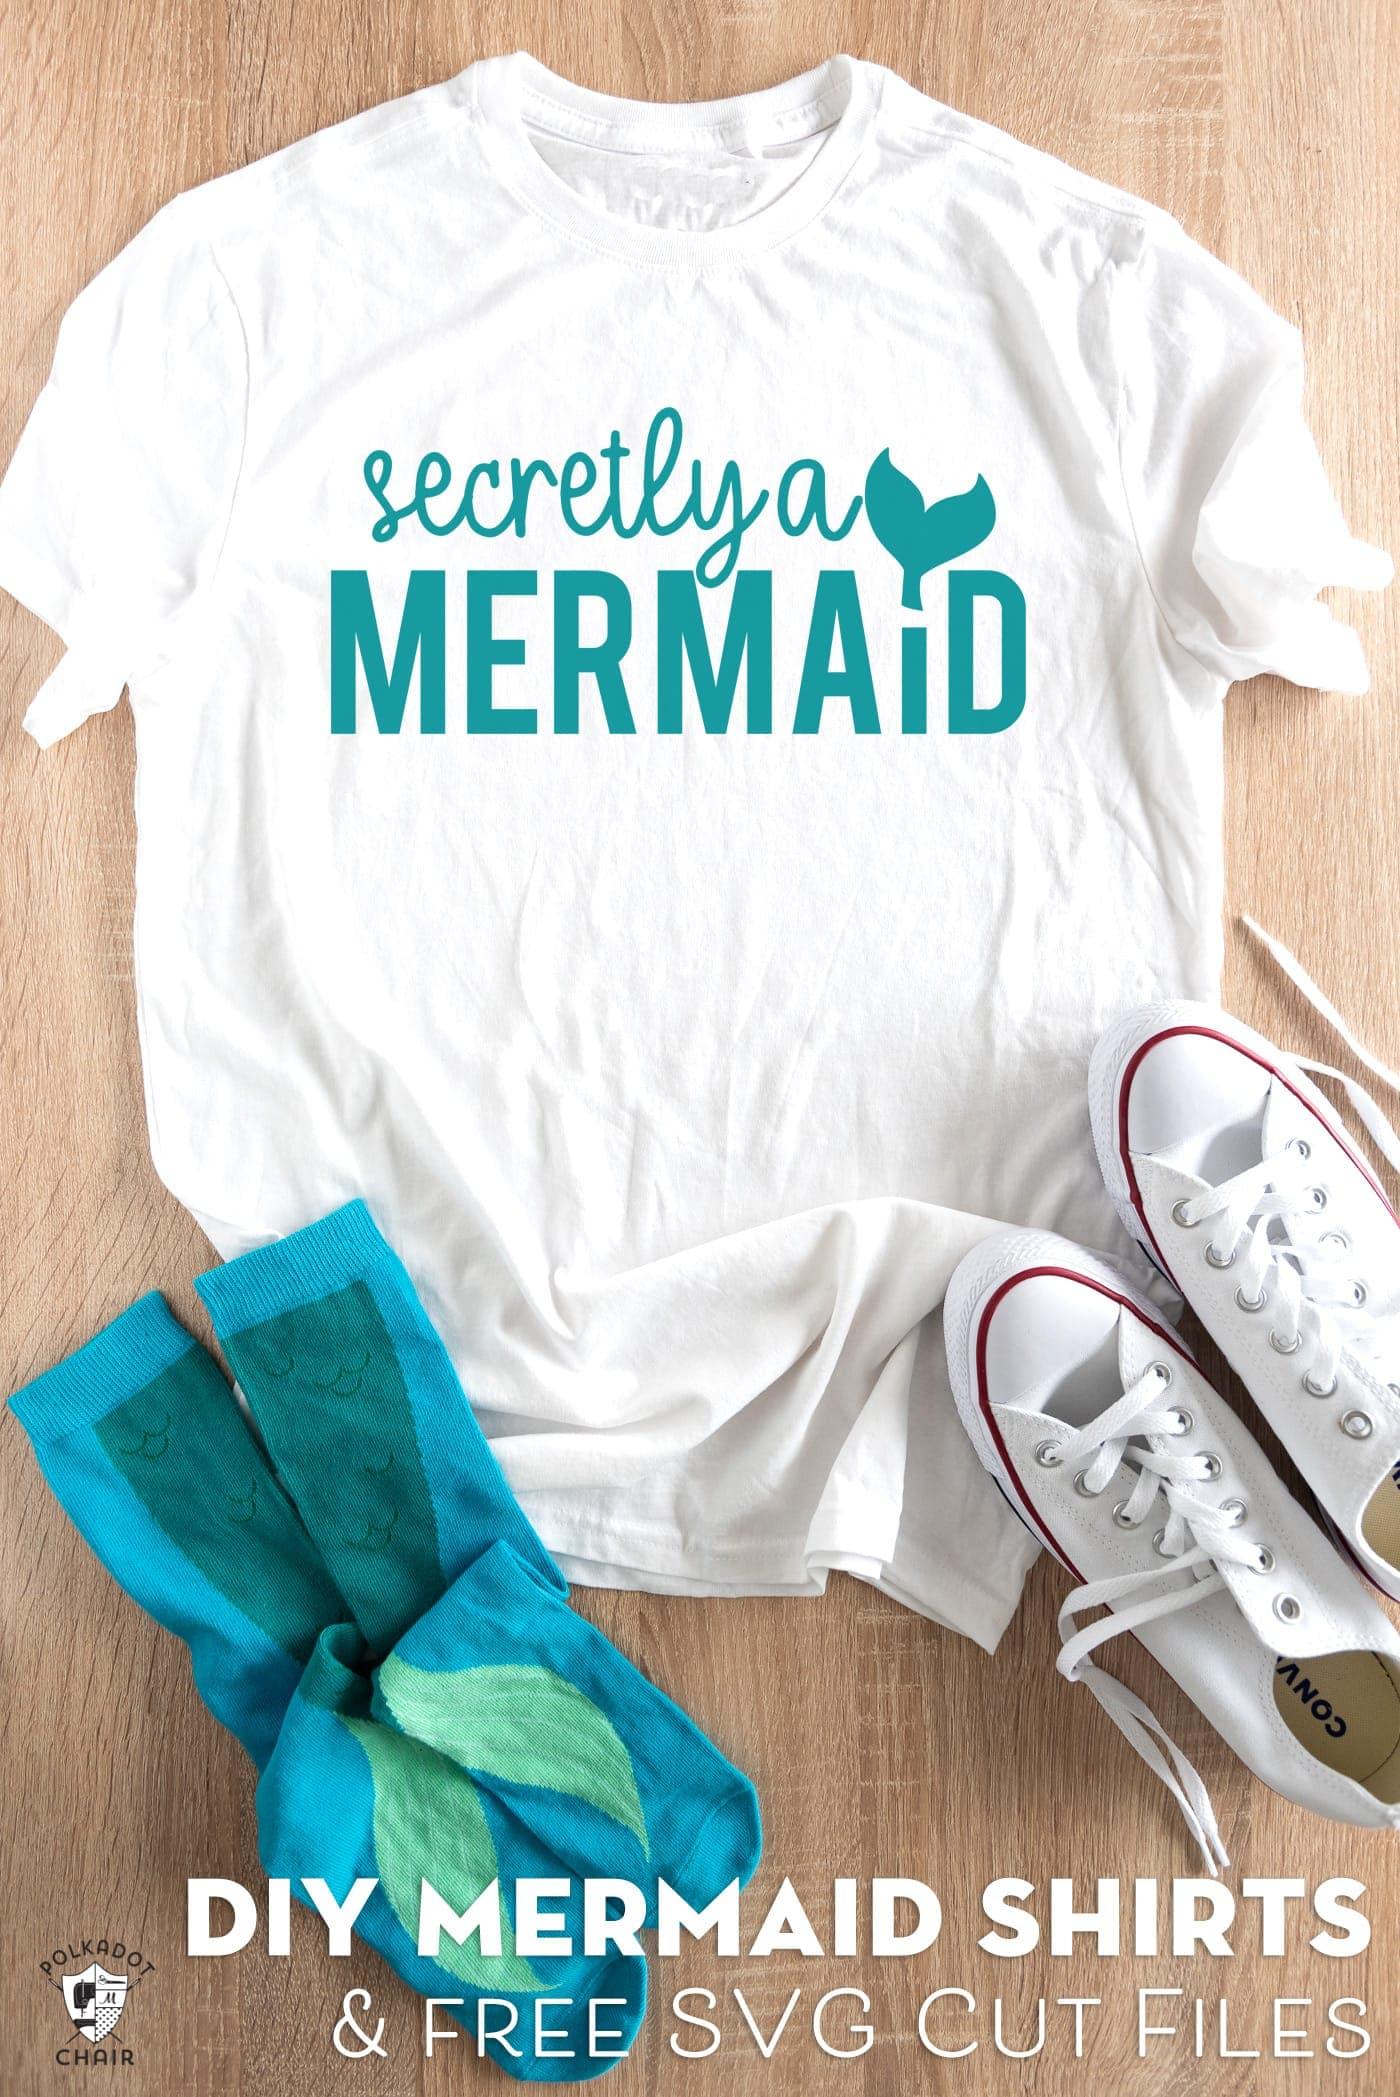 Mermaid SVG Cut Files for Cricut Machines | The Polka Dot ...